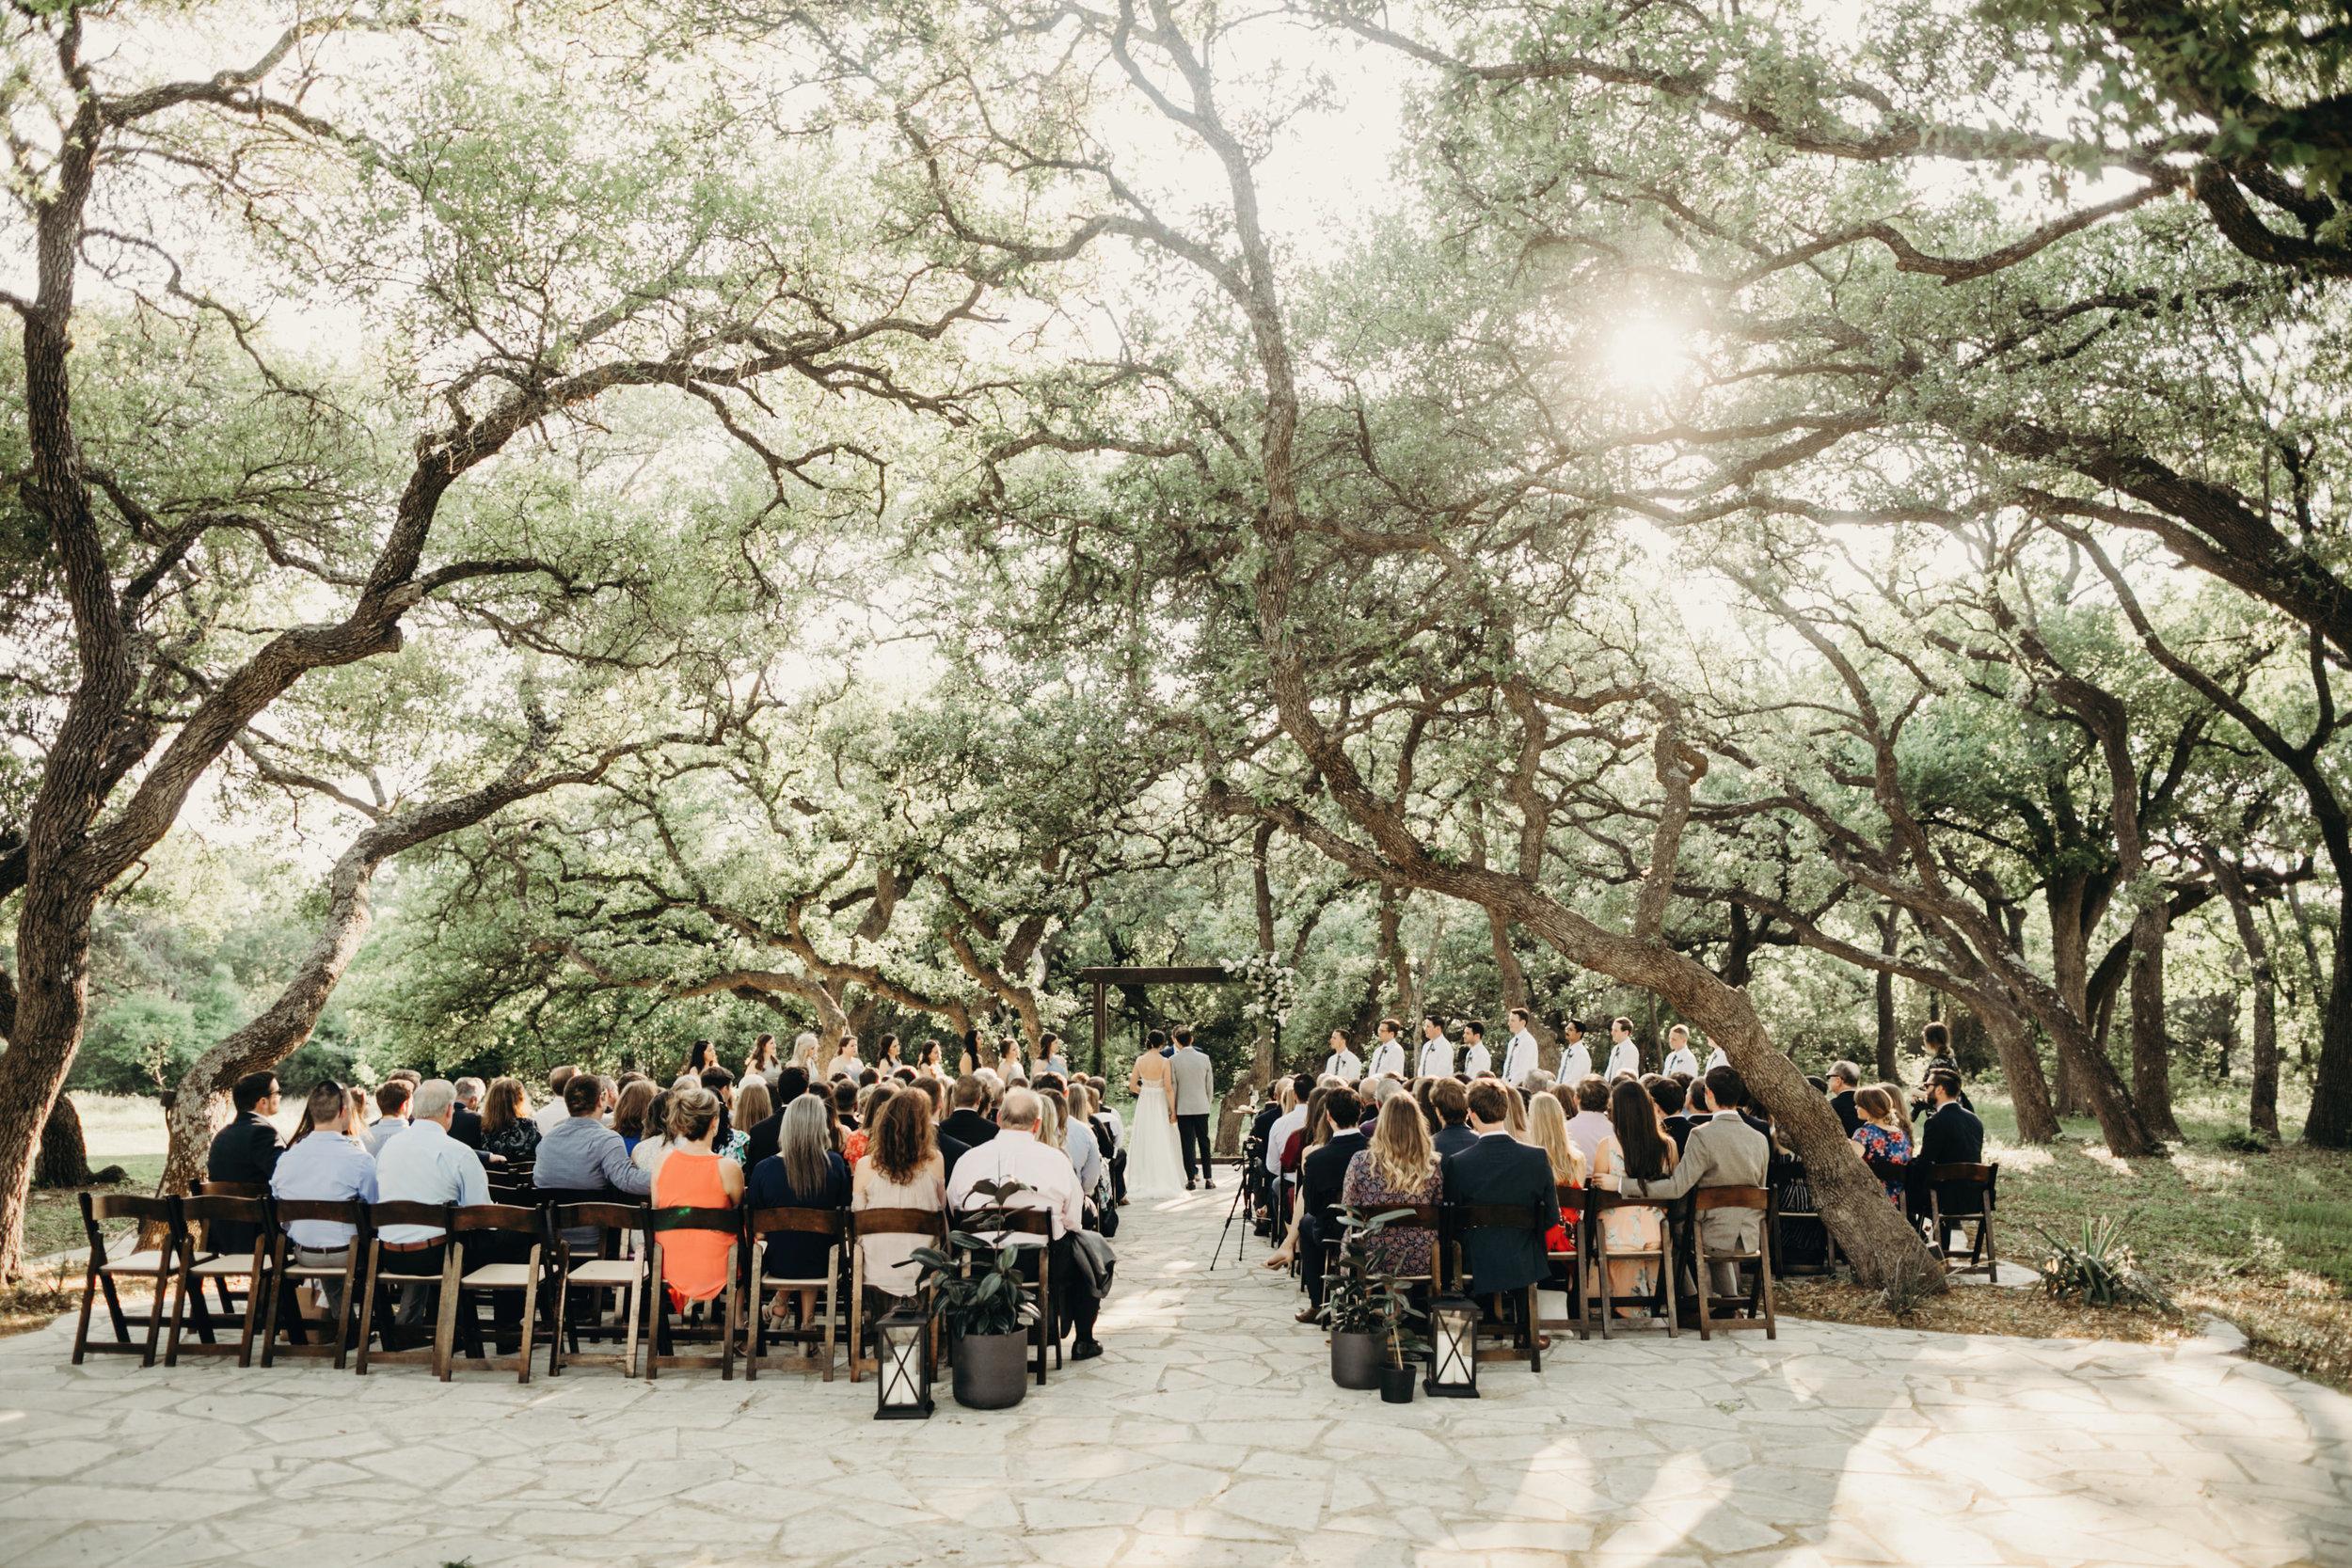 austin-wedding-lindsey-bryce-347.jpg